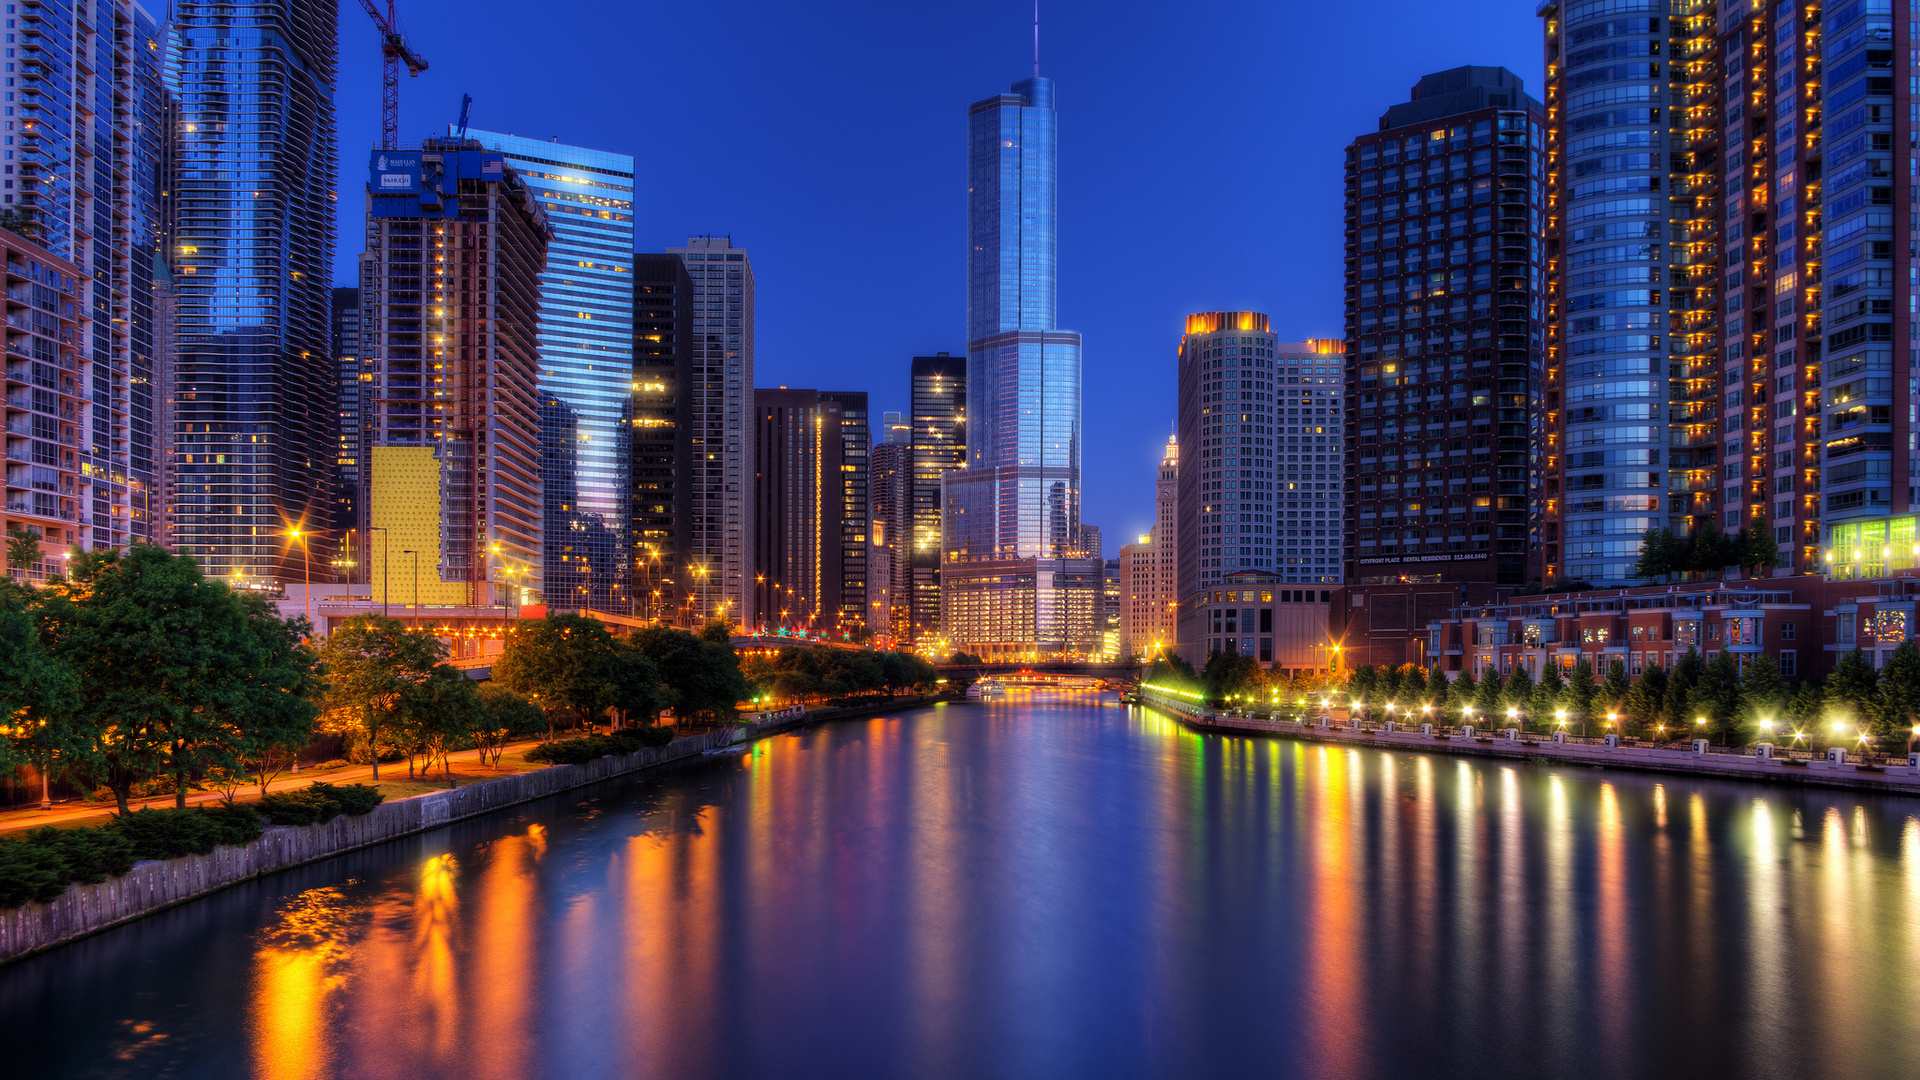 1920x1080 Chicago Night Chicago Illinois Usa The City 1920x1080